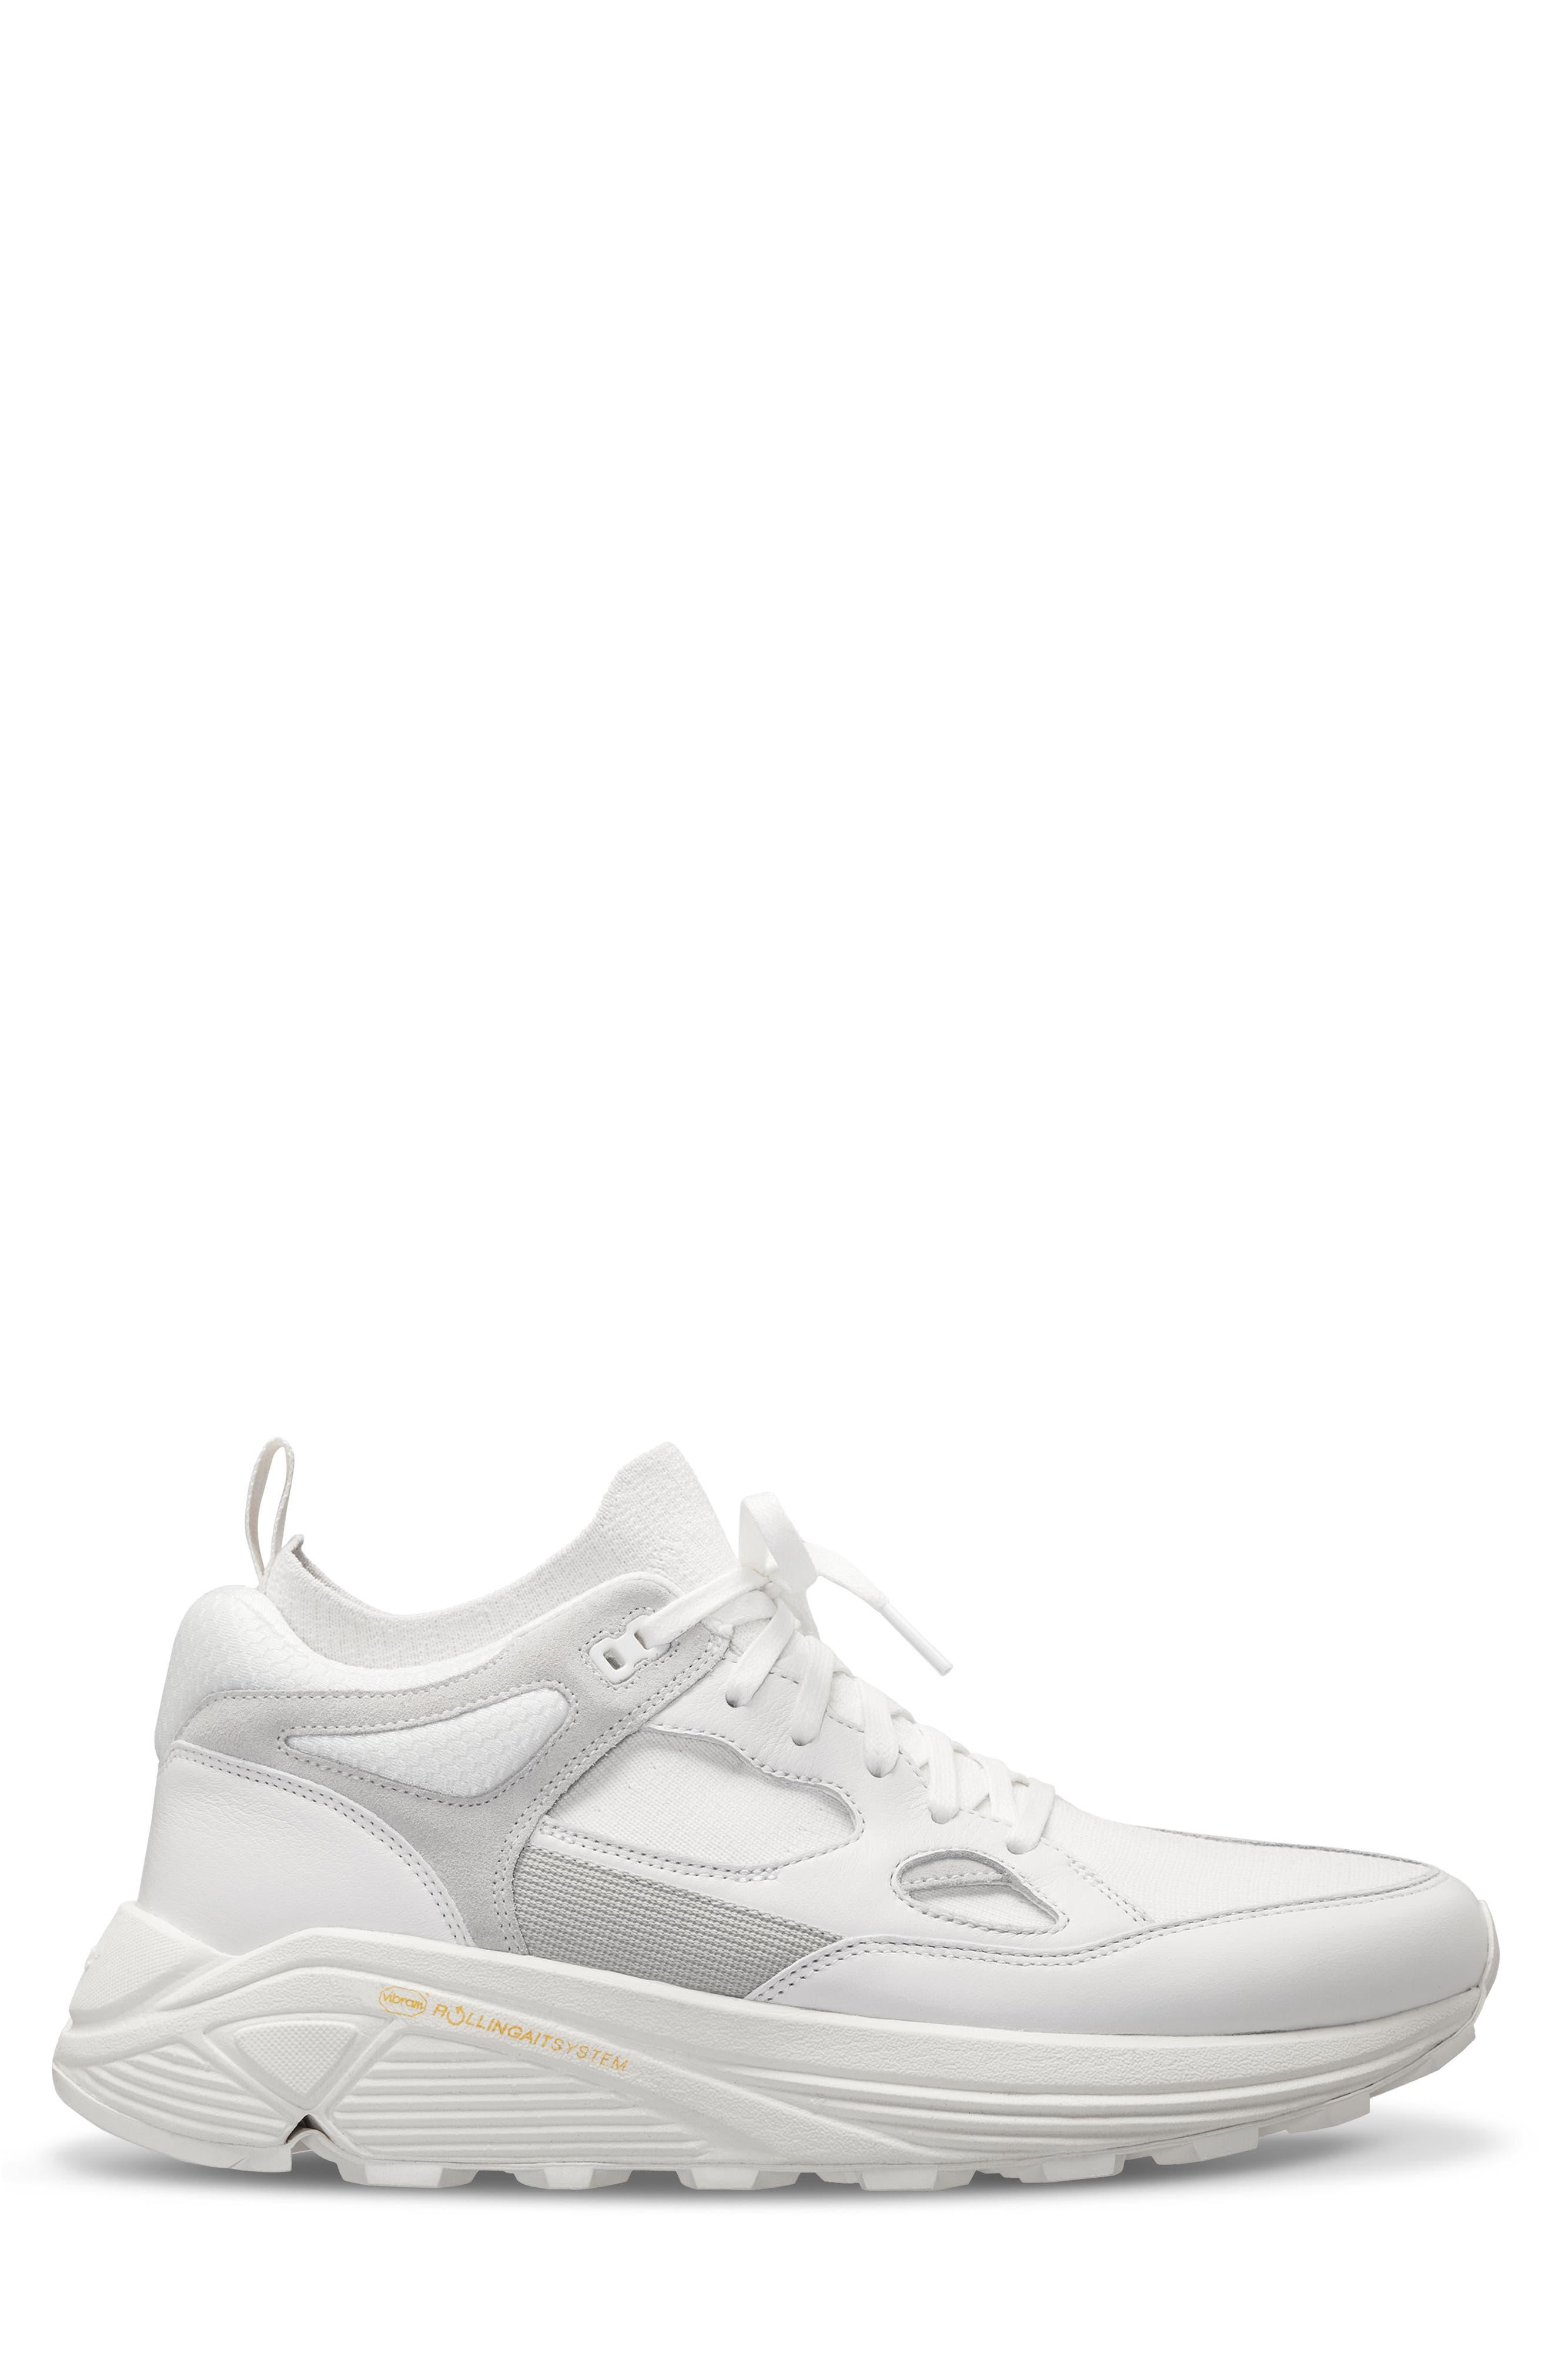 Aura Sneaker,                             Alternate thumbnail 10, color,